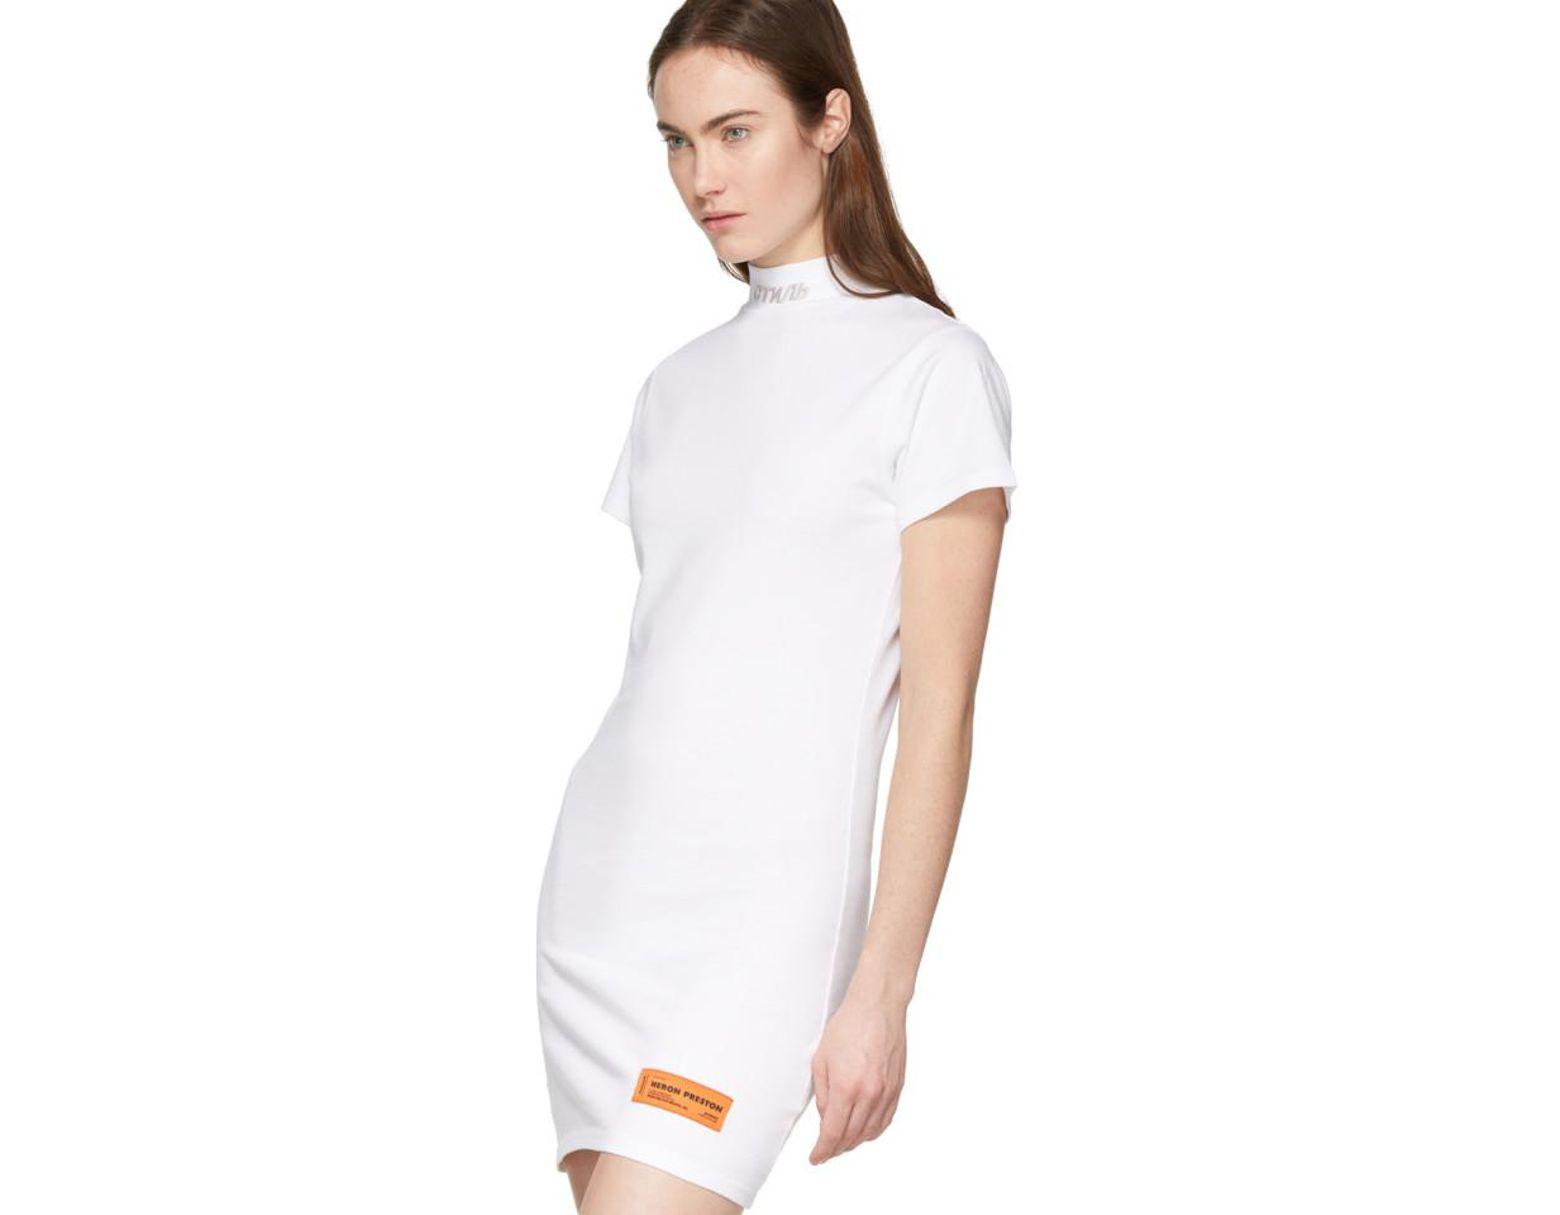 540b4ee16ba3 Heron Preston White Style Mock Neck T-shirt Dress in White - Save 7% - Lyst